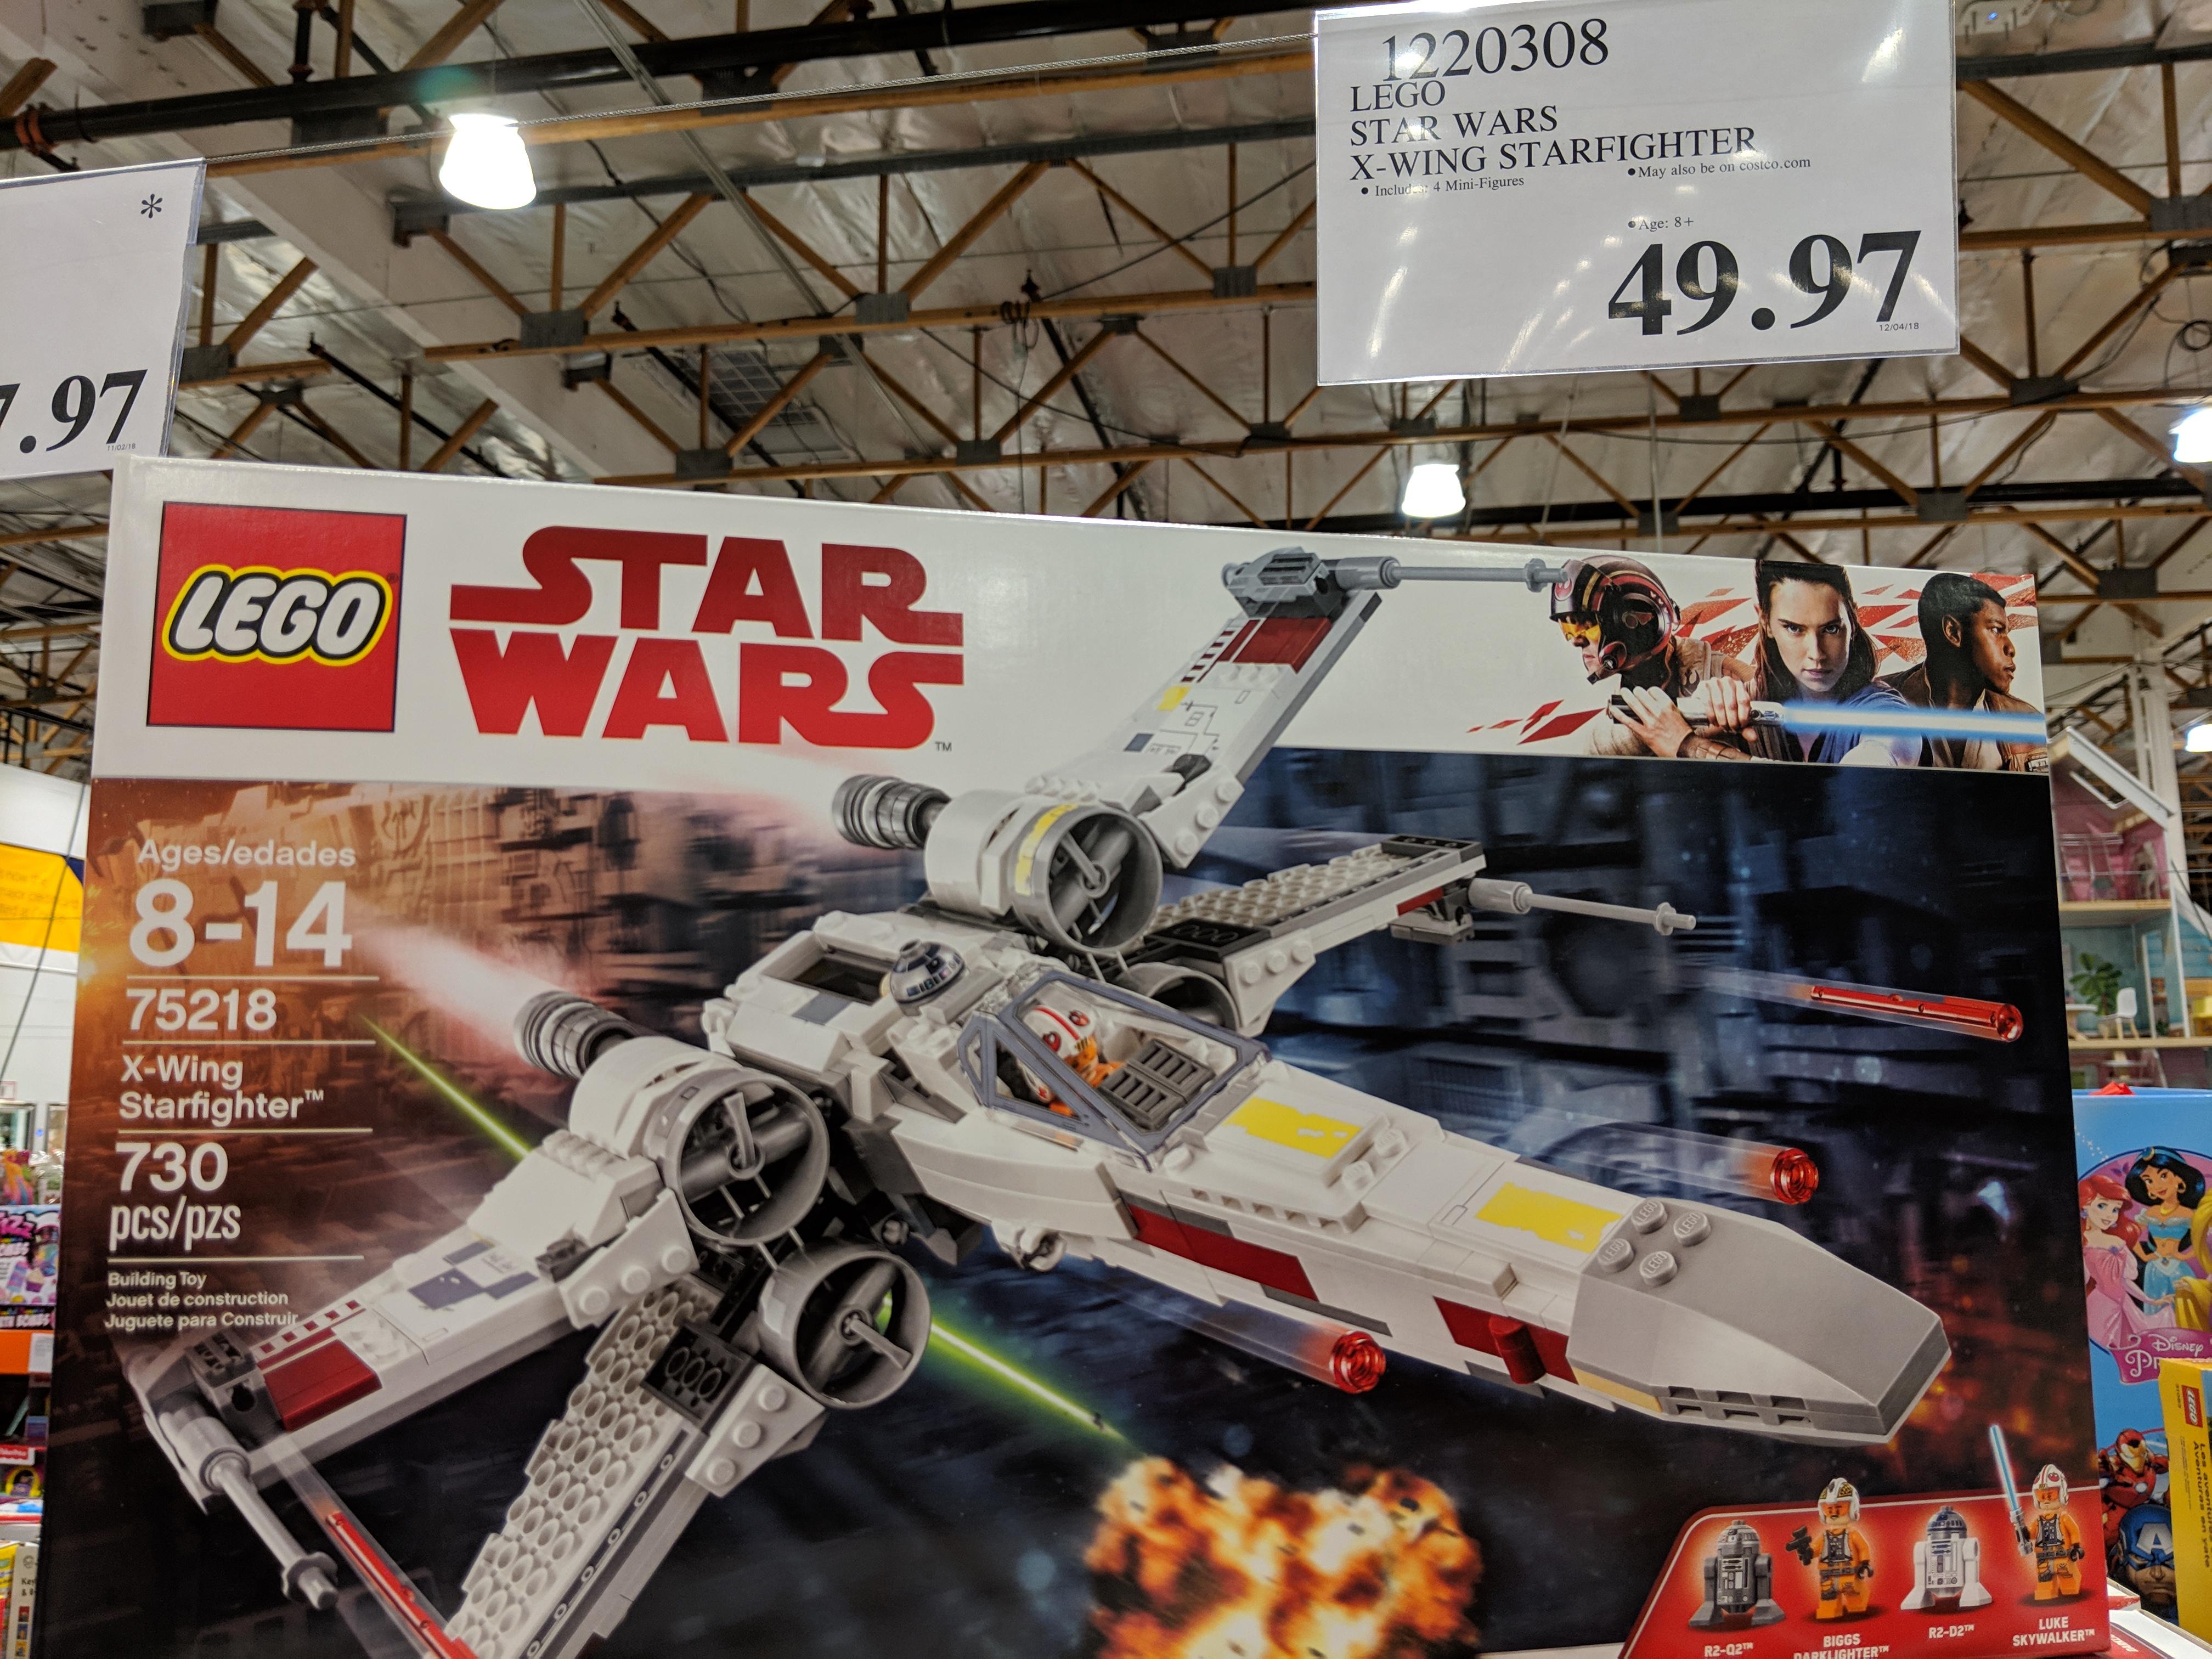 Lego 75218 Star Wars X Wing Starfighter 50 Costco Bm